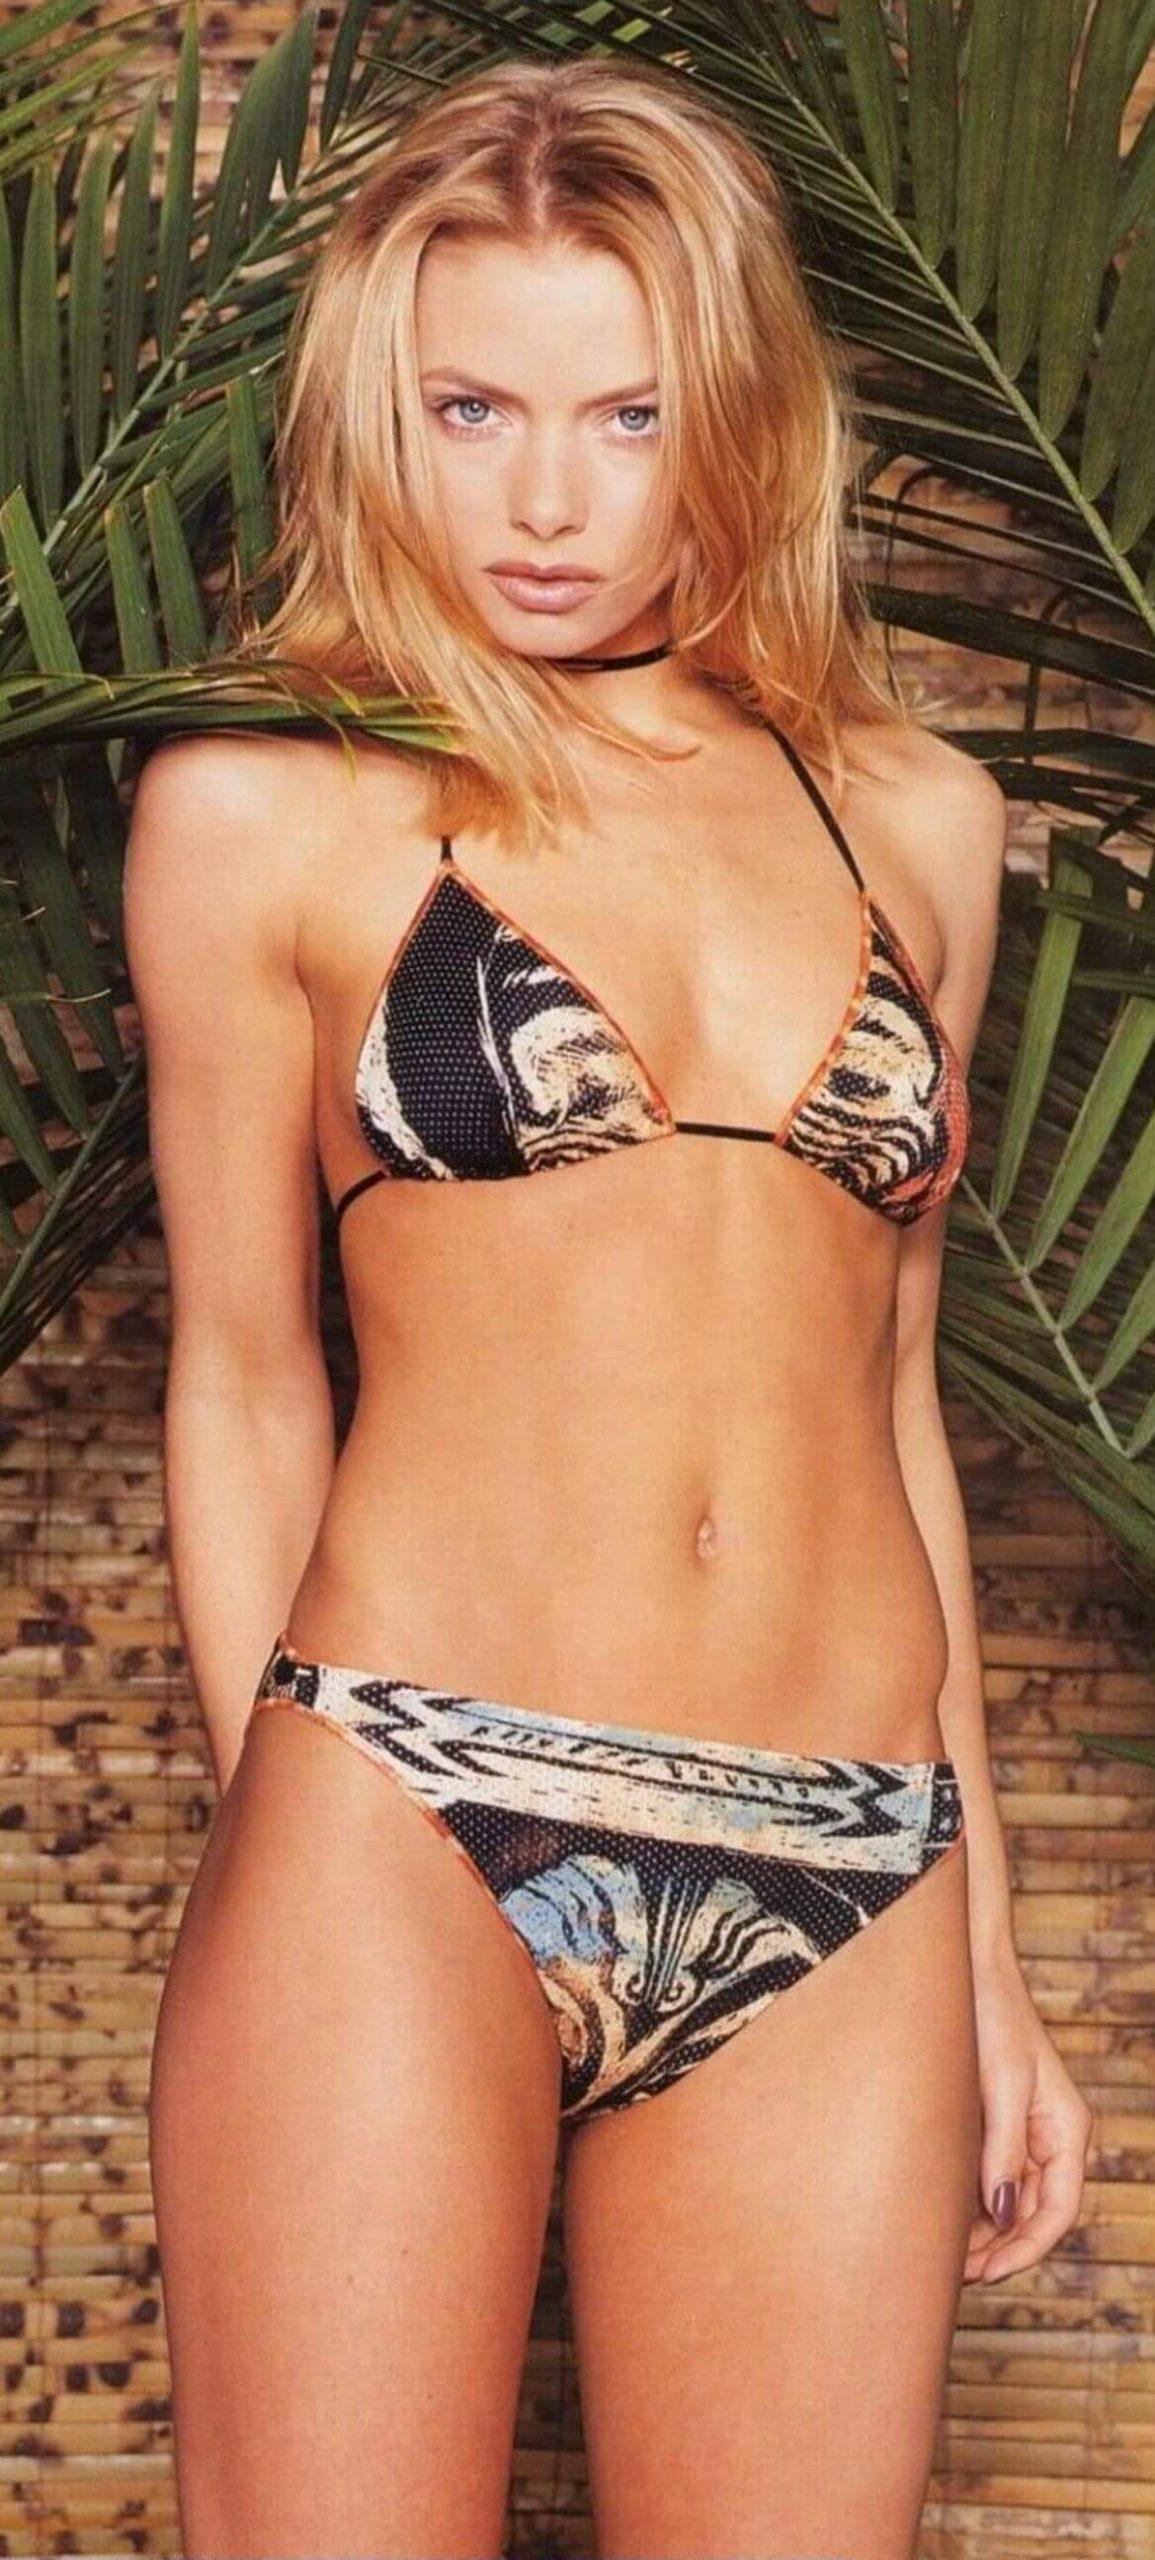 Jaime Pressly hot bikini pics